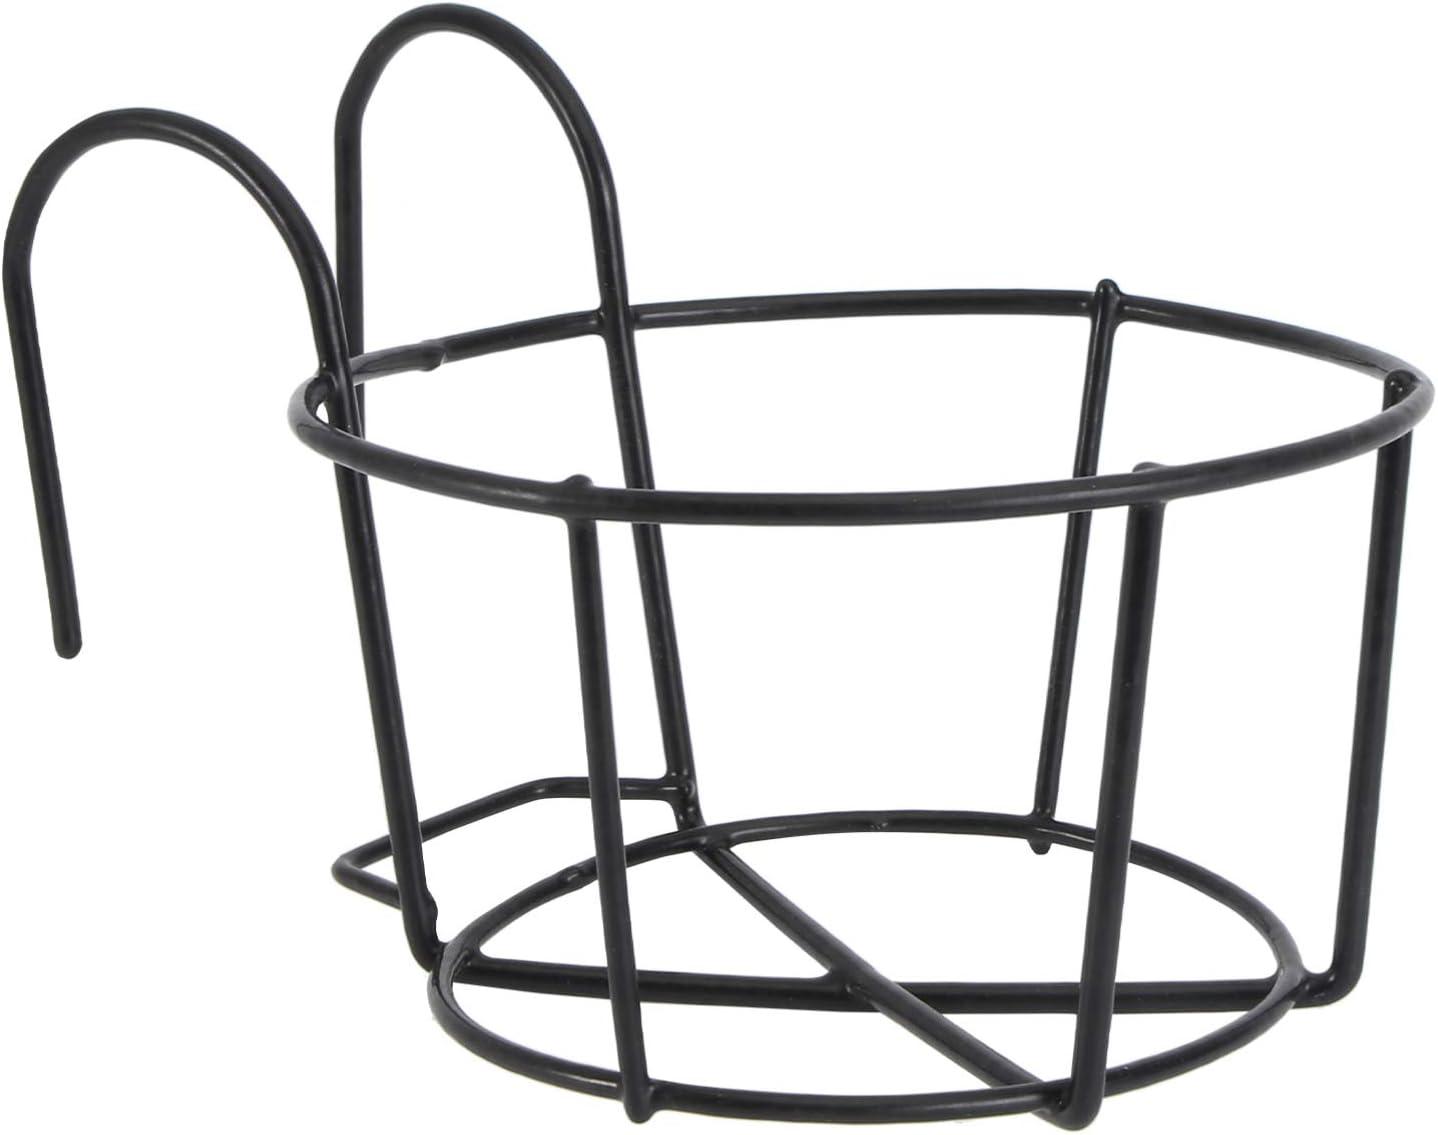 OUNONA Metal Hanging Flower Pot Holder Iron Hanging Planter Pot Support Stand with Detachable Hook Garden Home Ornaments (16cm x 16cm x 15cm Black)